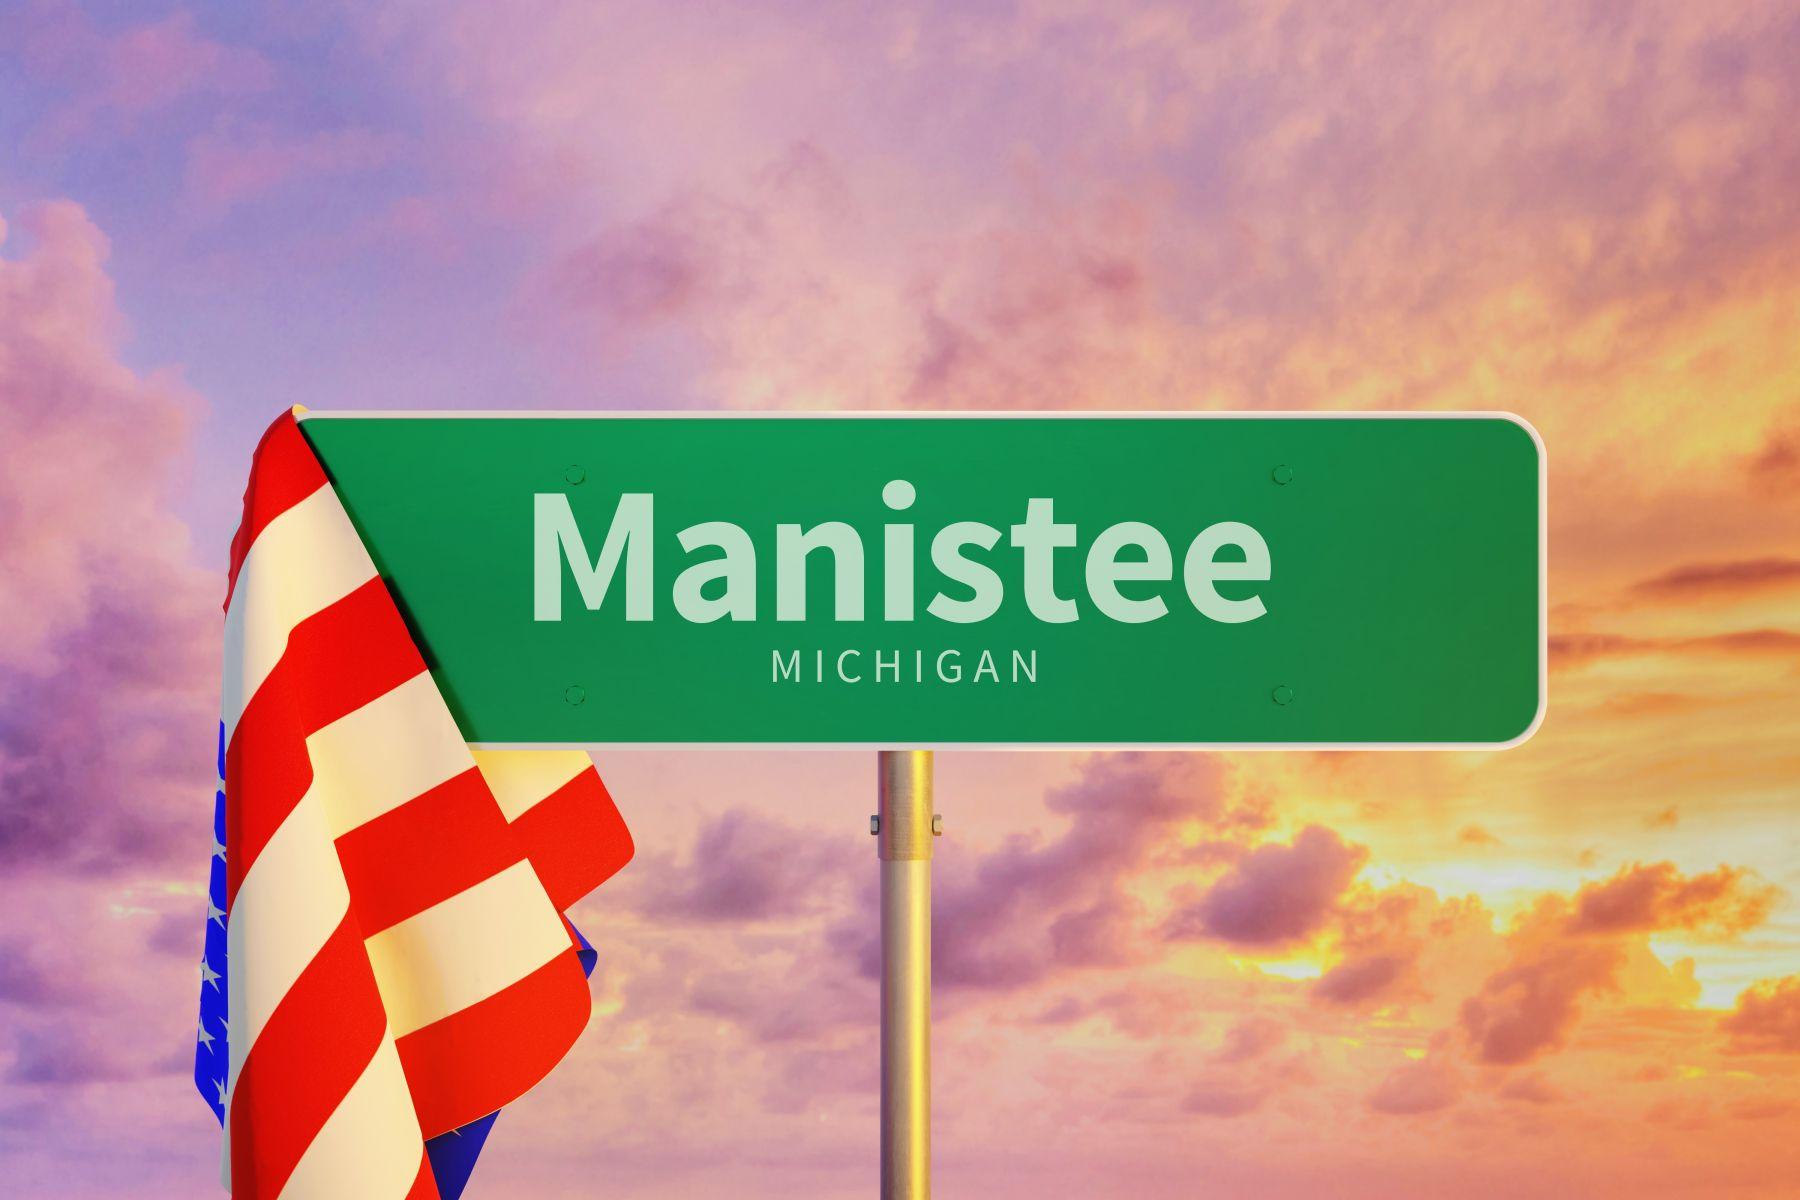 Manistee